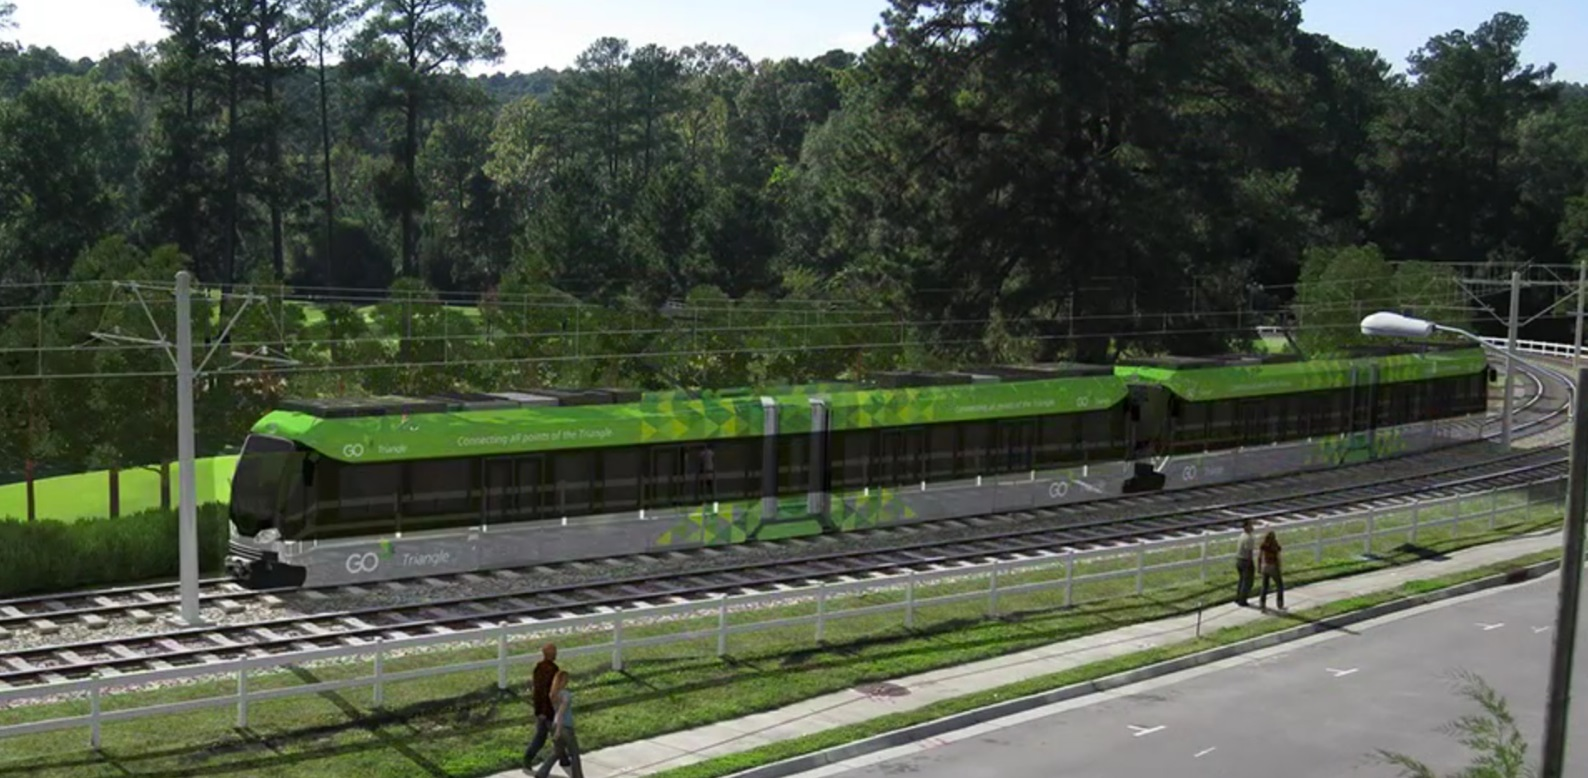 go-triangle-light-rail-durham & Raleigh-Durham: Light Rail rapid transit-Durham to Chapel Hill ... azcodes.com